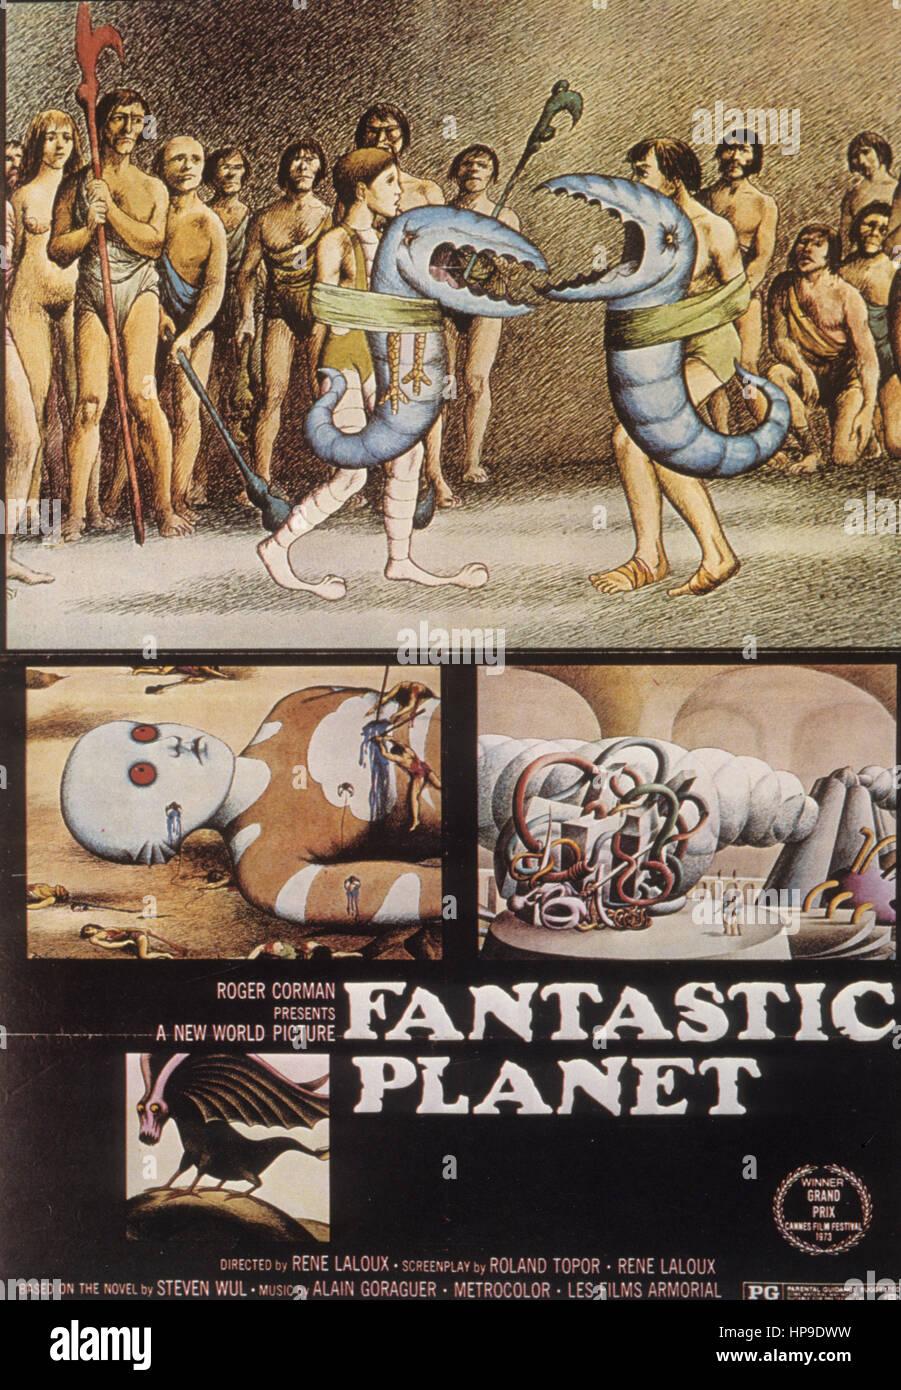 fantastic planet,1973 - Stock Image